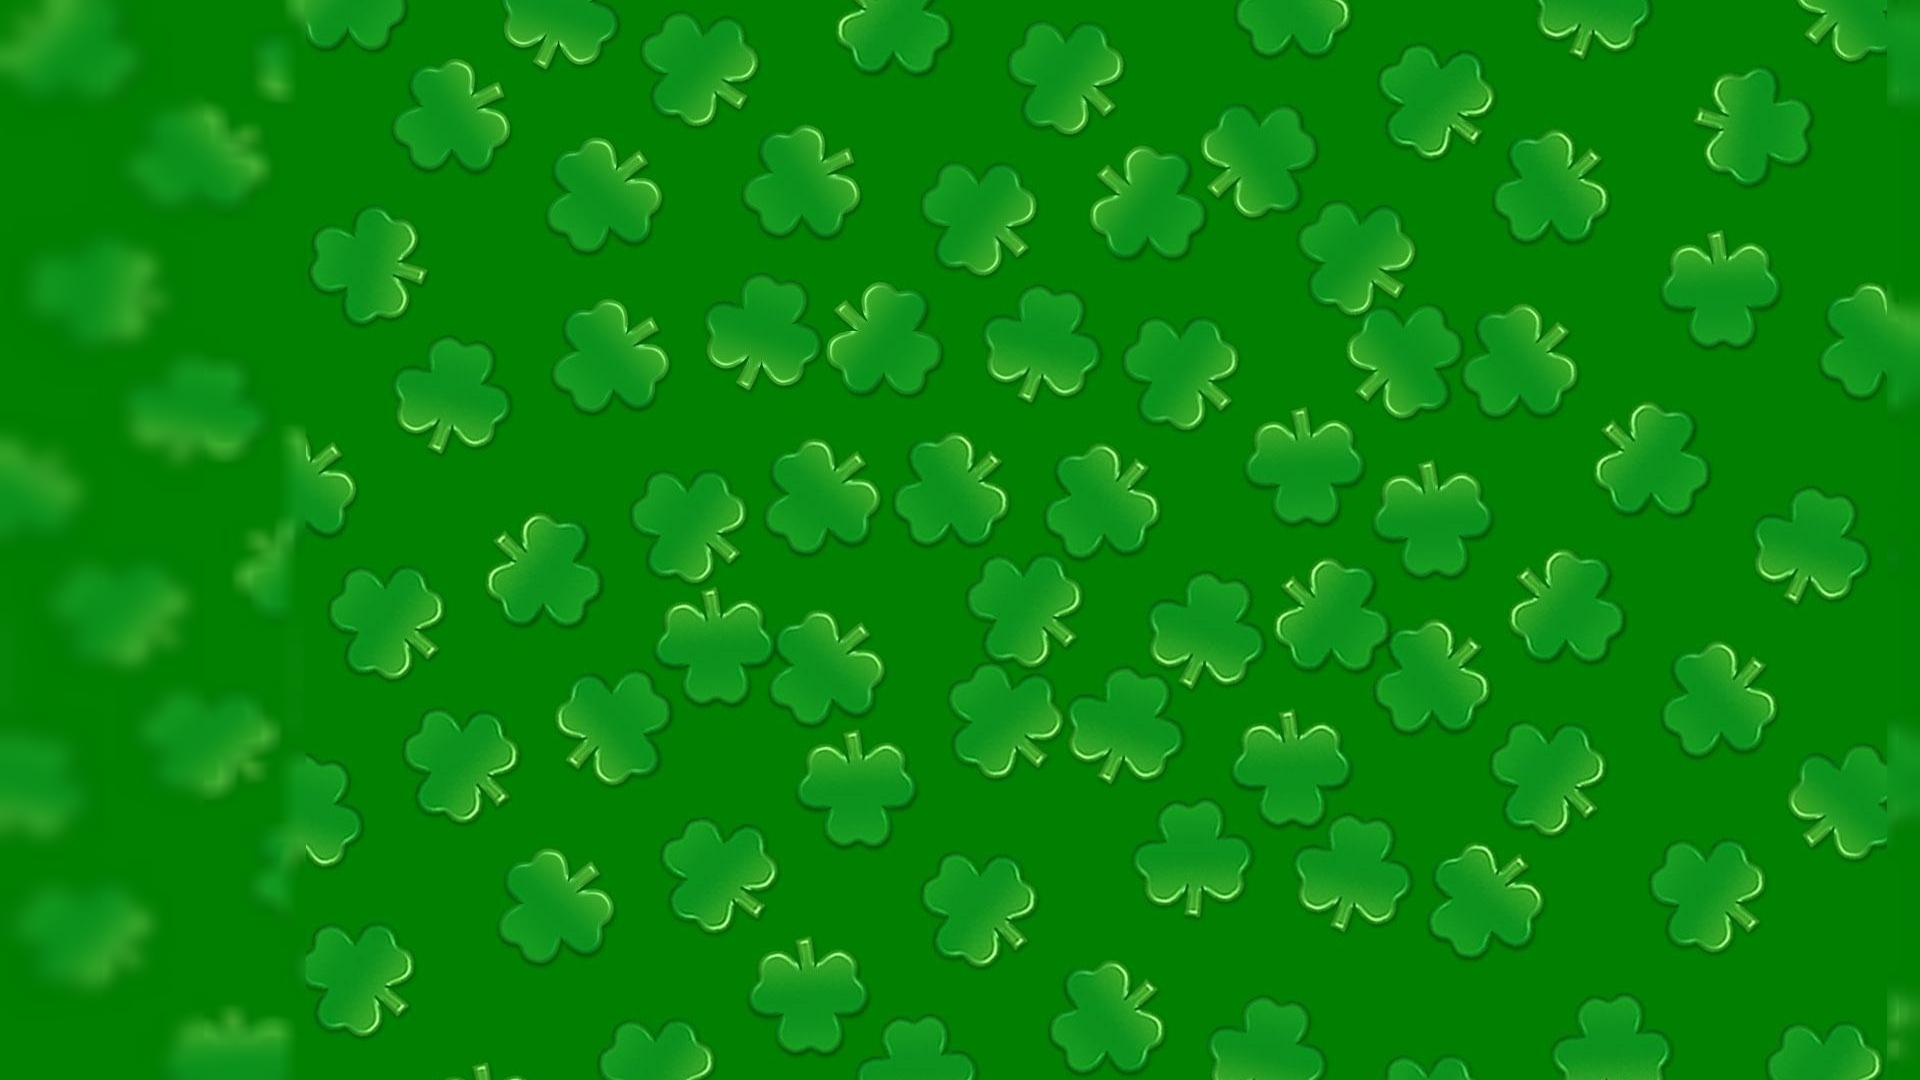 download St Patricks St Patricks Day St Patricks Day HD 1920x1080